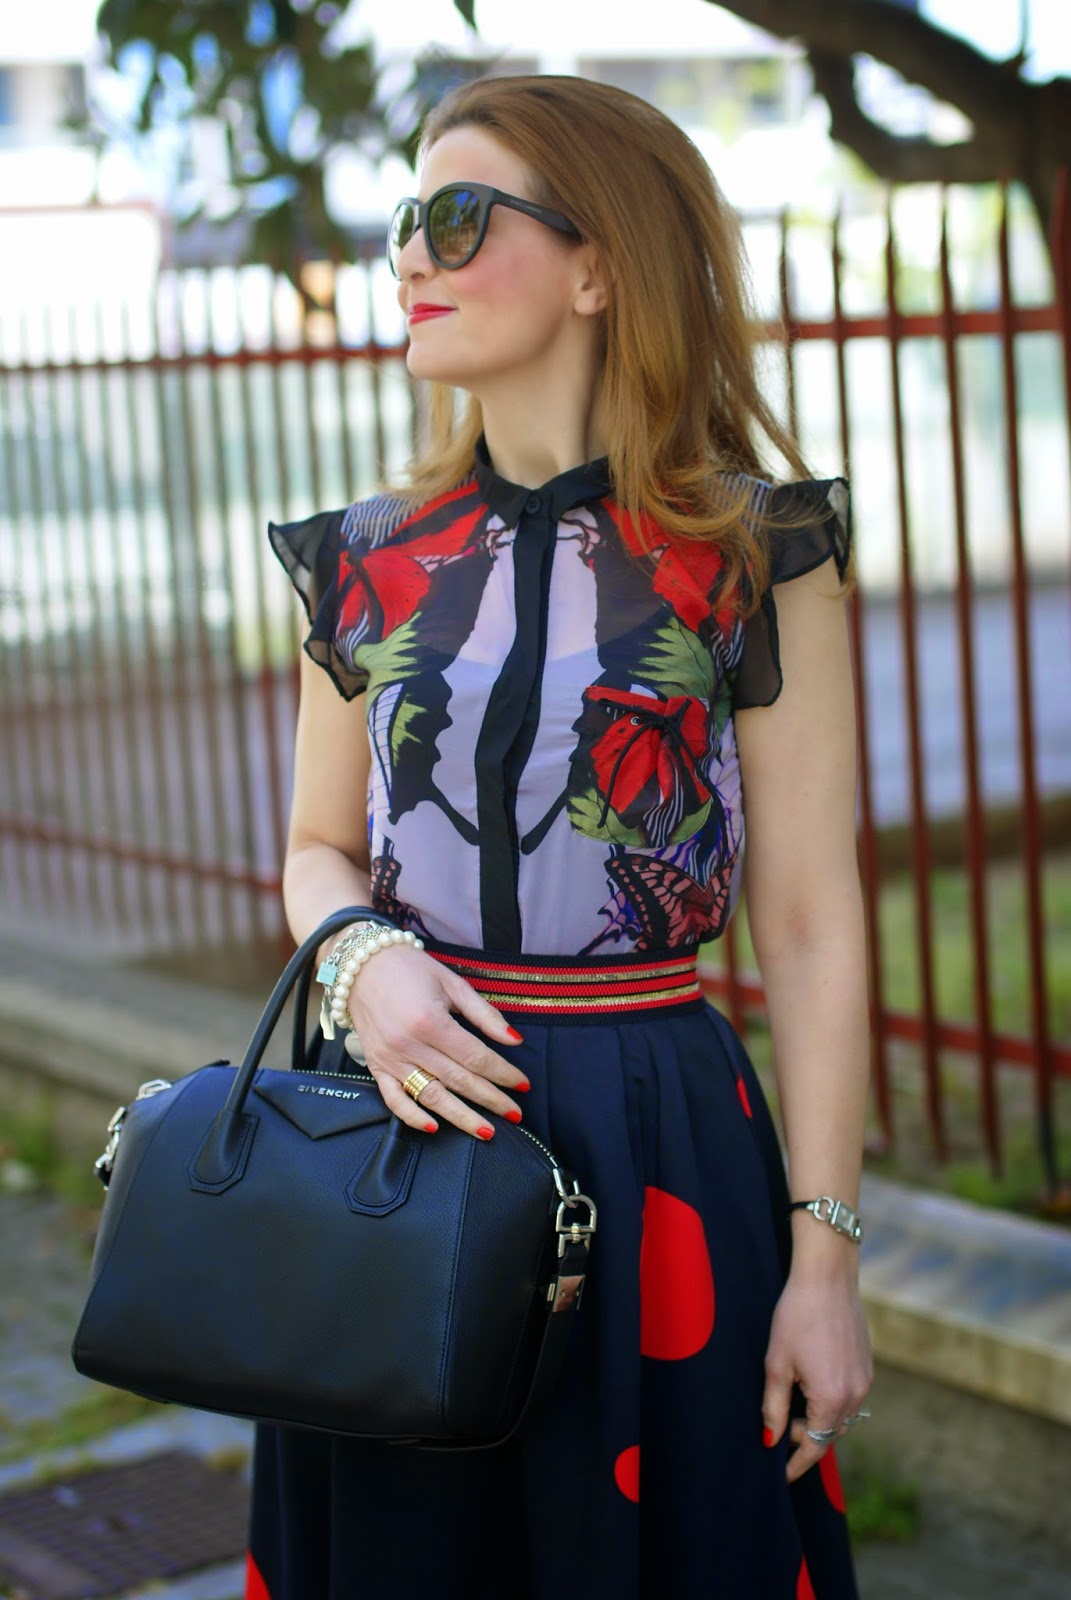 Smash! Saura blouse, Zaful polka dot skirt, large polka dot print, mix of prints on Fashion and Cookies fashion blog, fashion blogger style